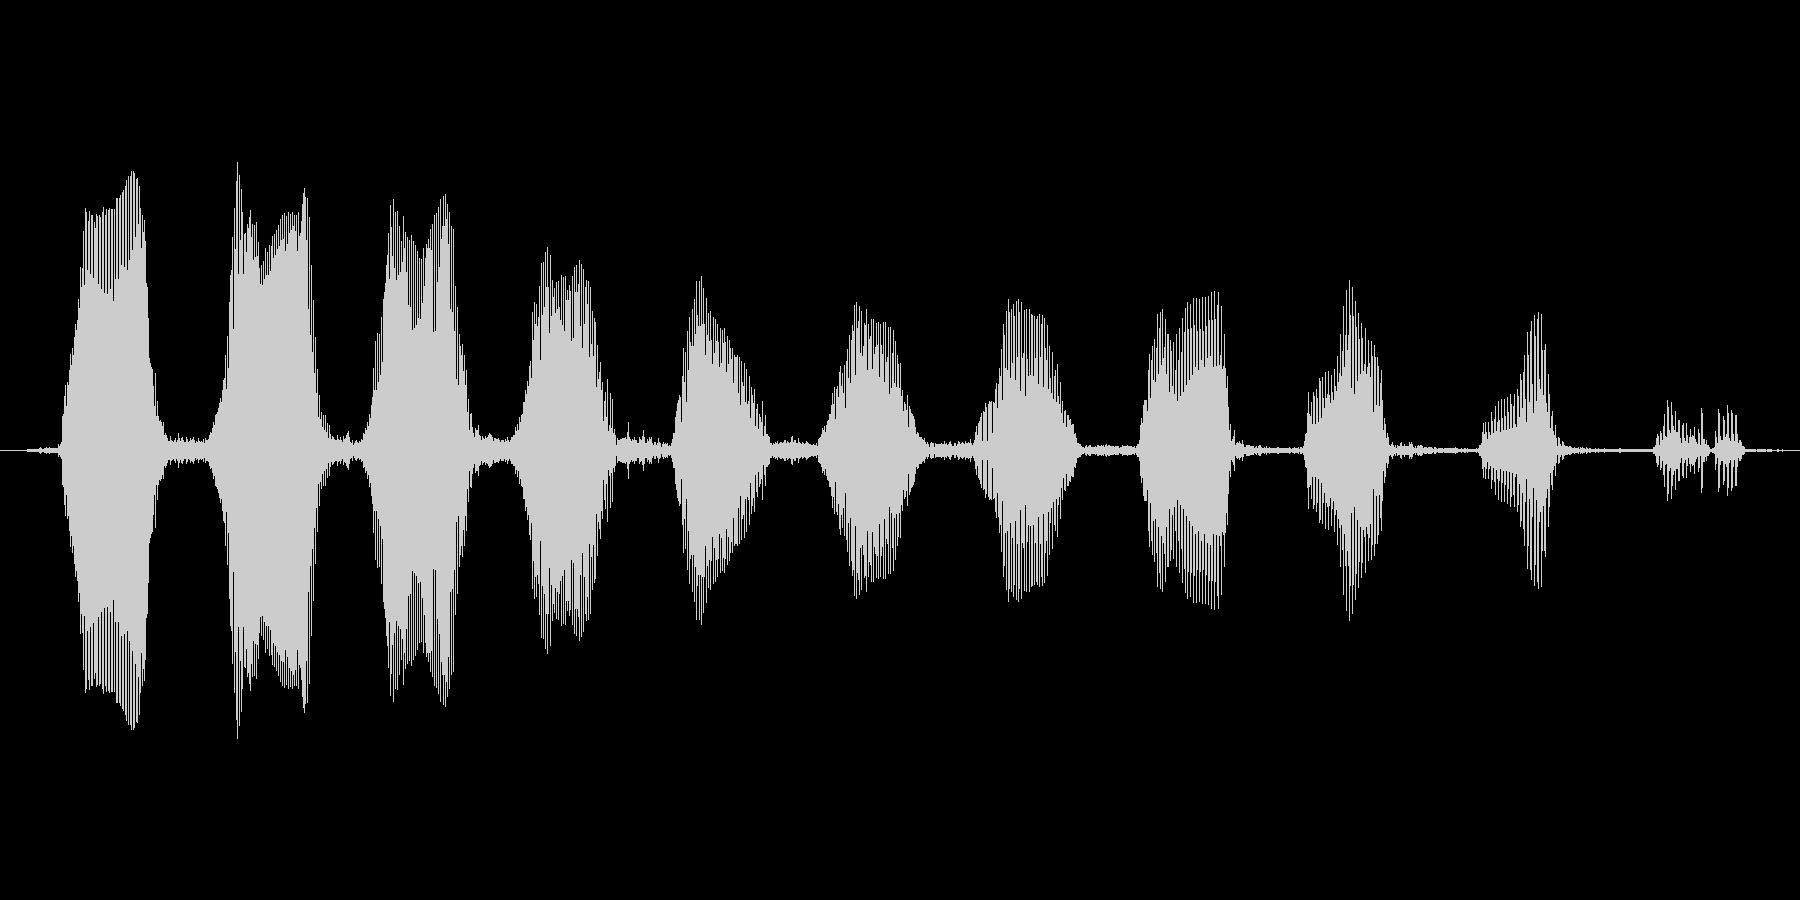 【笑い声】ひゃっひゃっひゃっひゃっひゃの未再生の波形